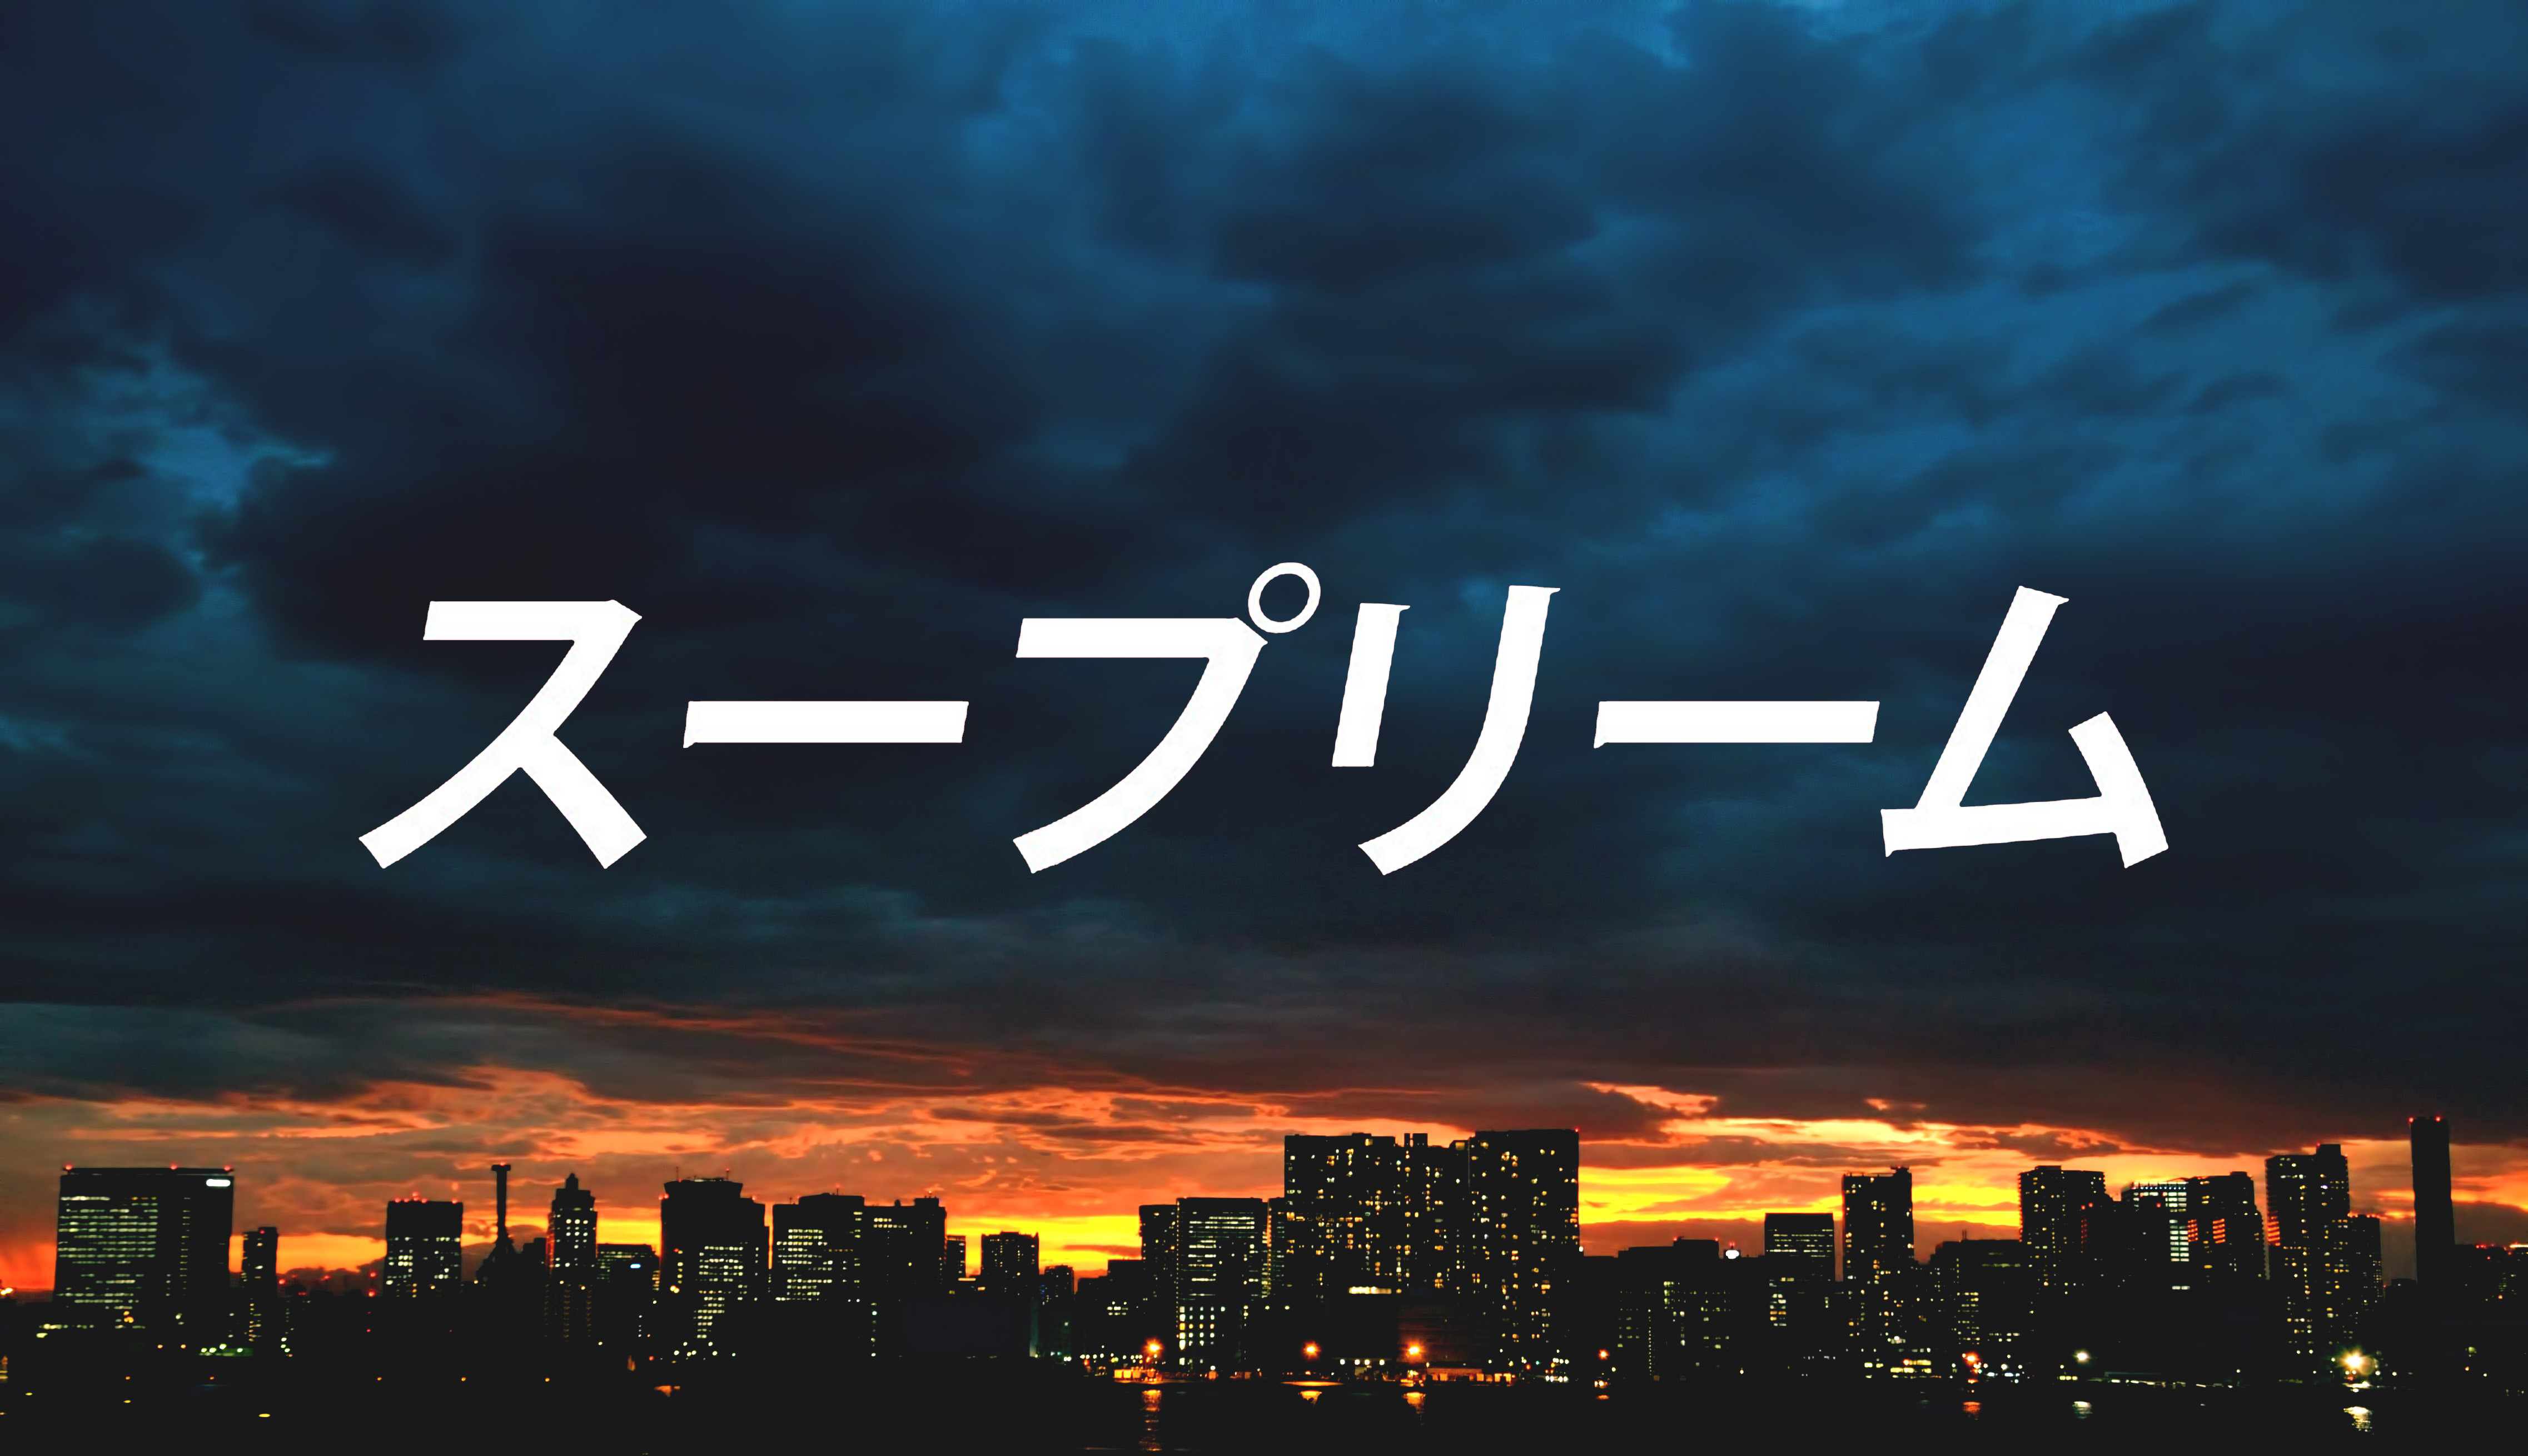 General 4548x2620 Japan supreme night town landscape sunset dusk clouds